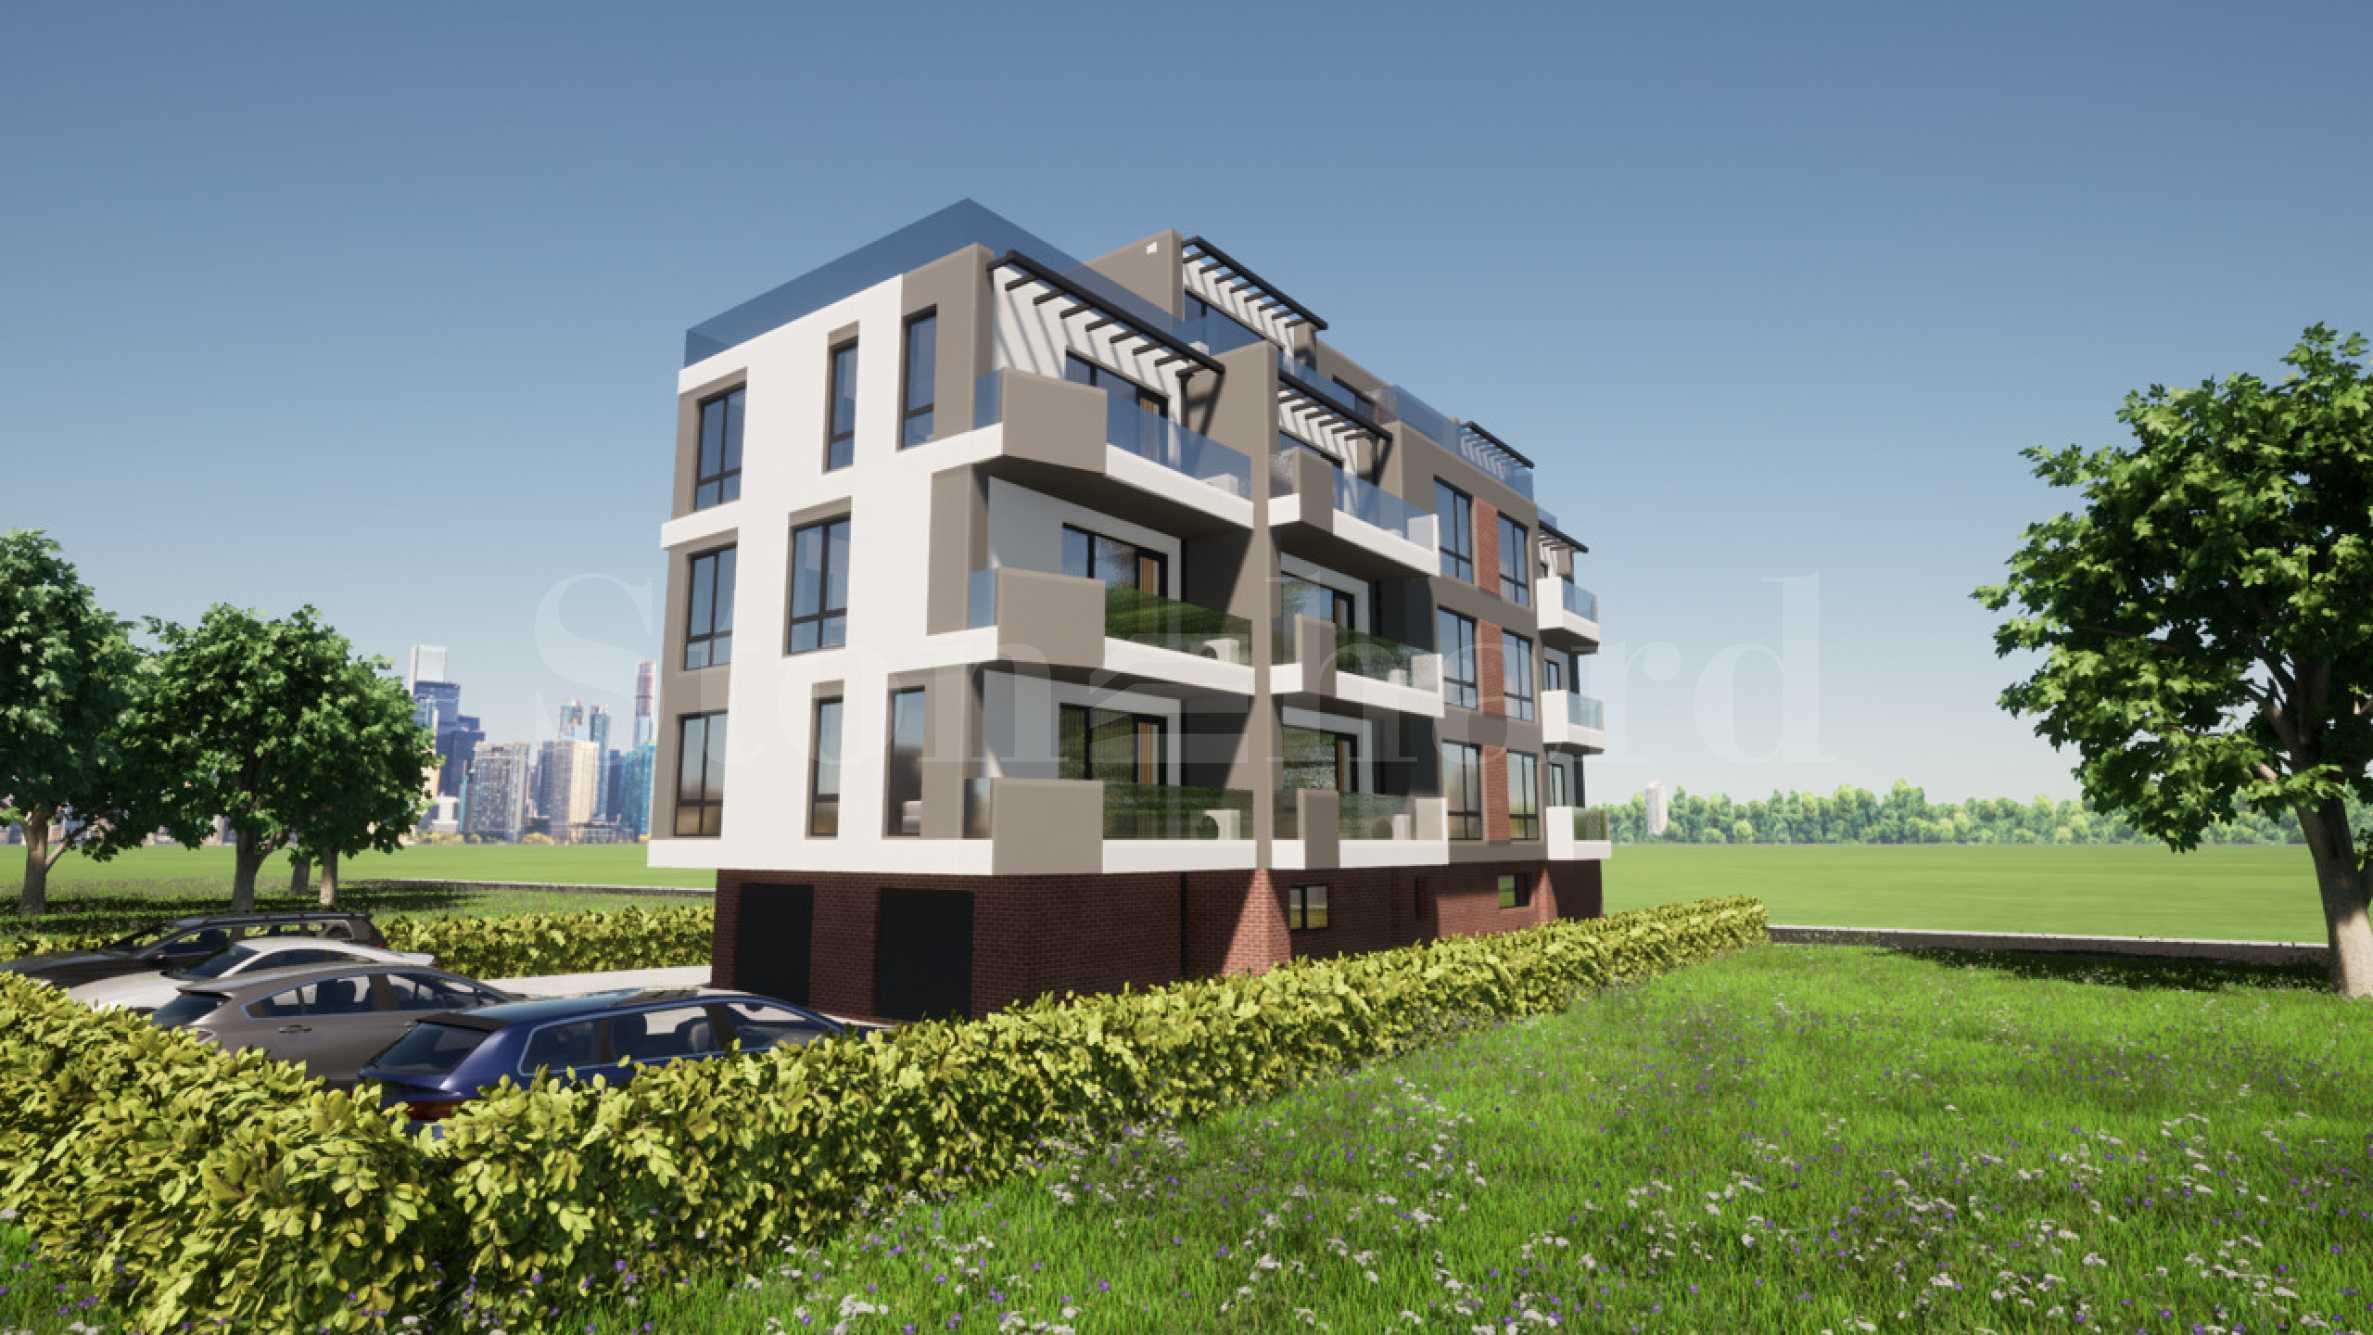 New-build seaside apartments in Burgas. No maintenance fee1 - Stonehard